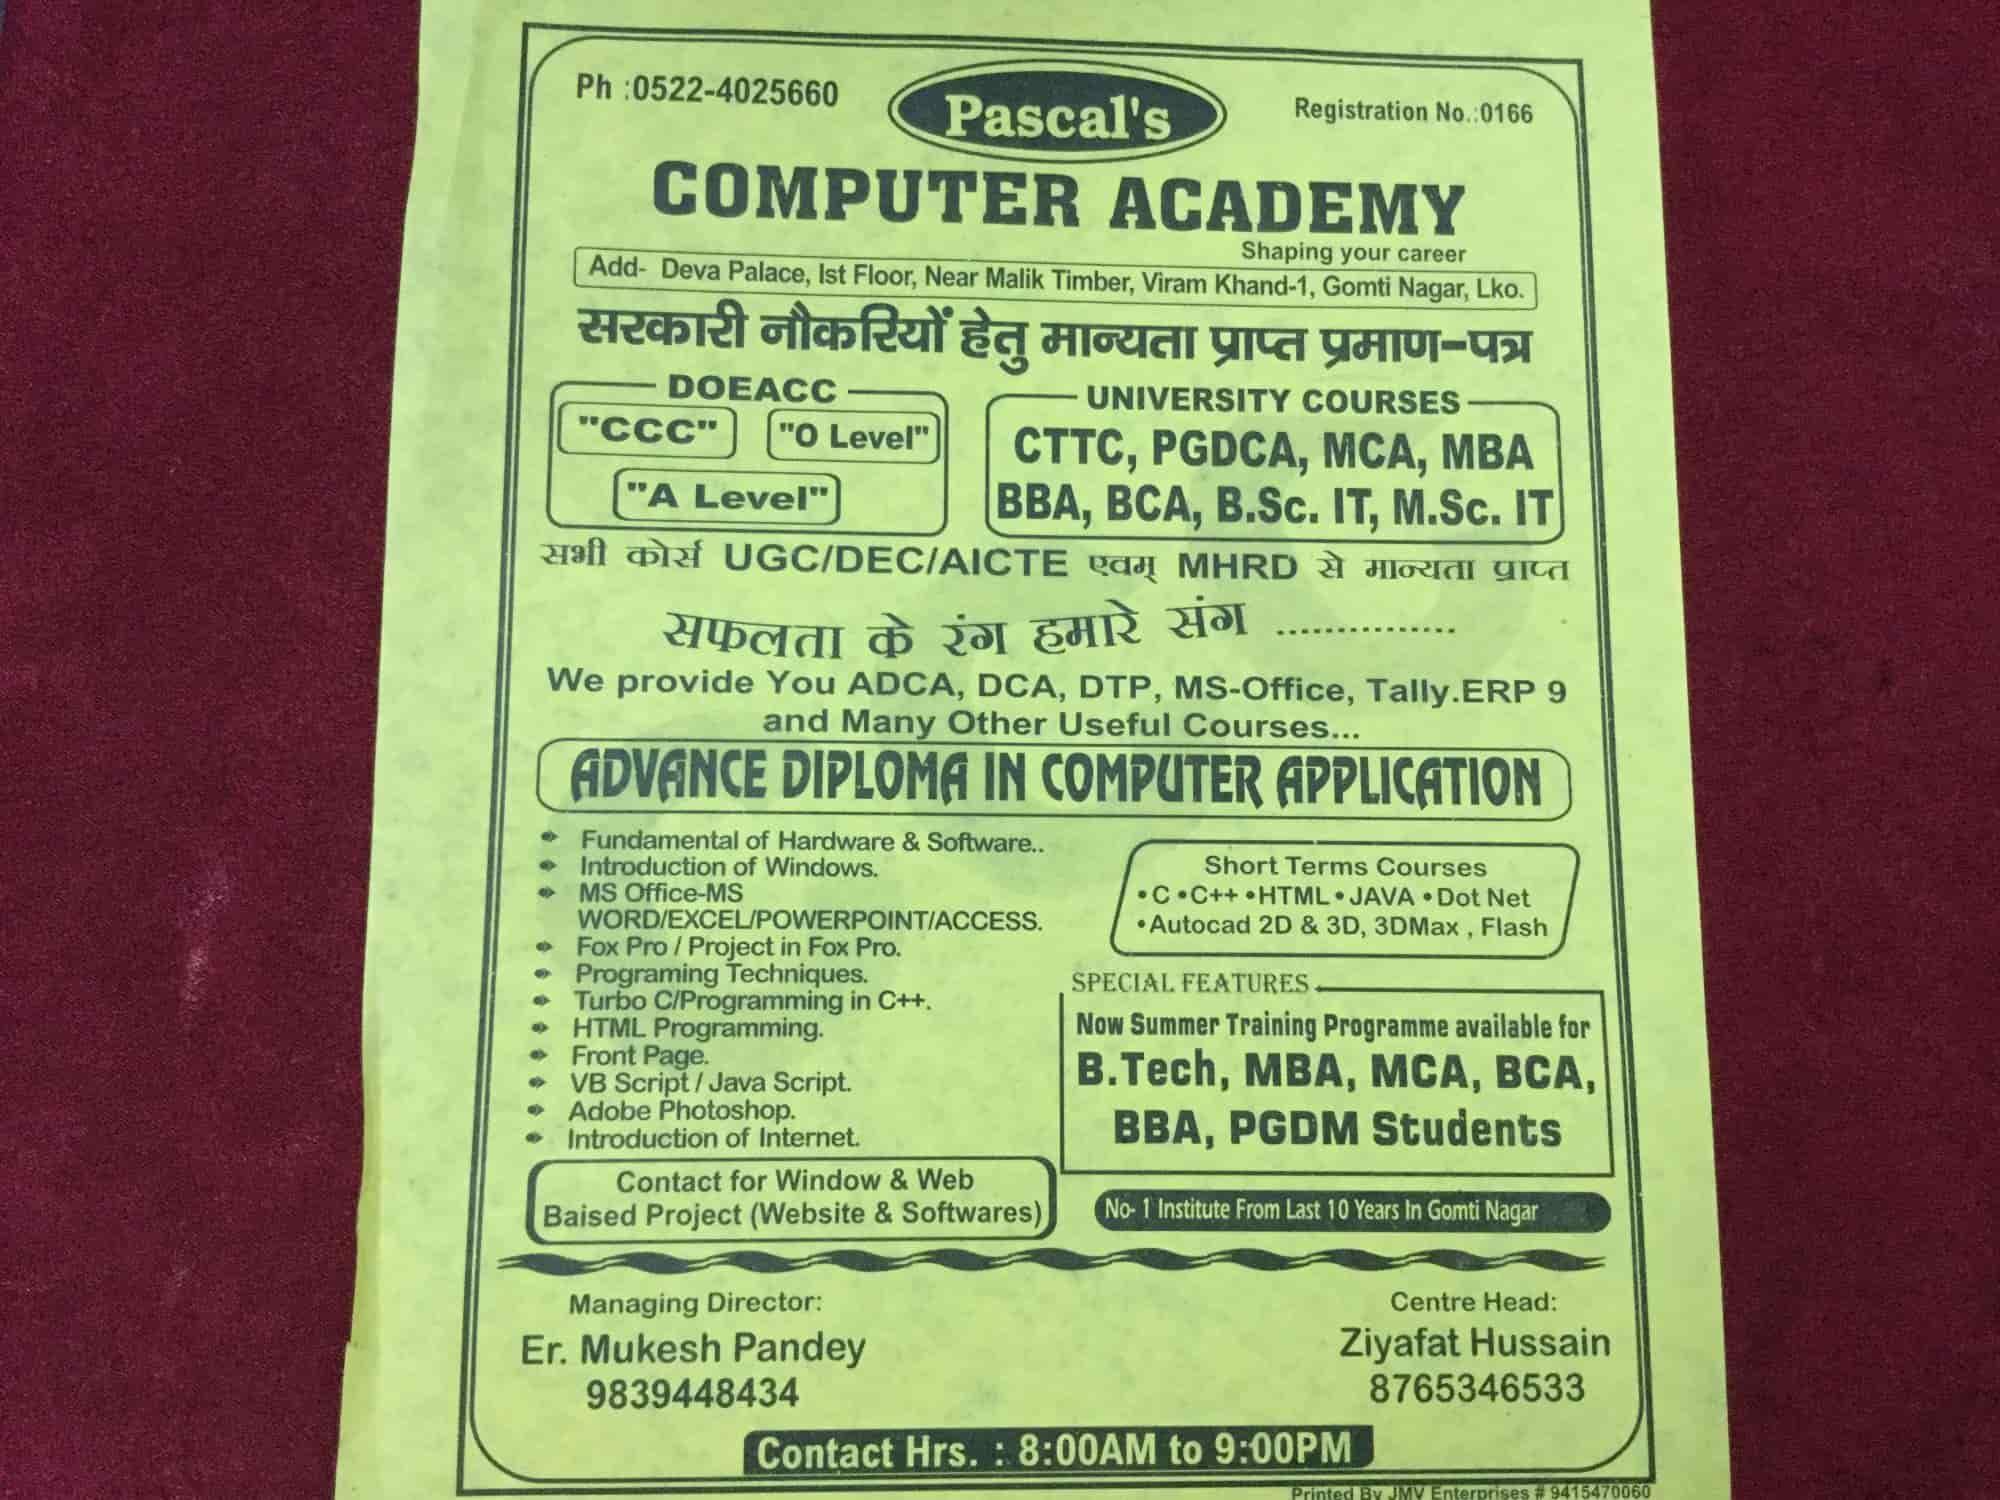 Pascal's Computer Academy, Gomti Nagar - AUTOCAD Training